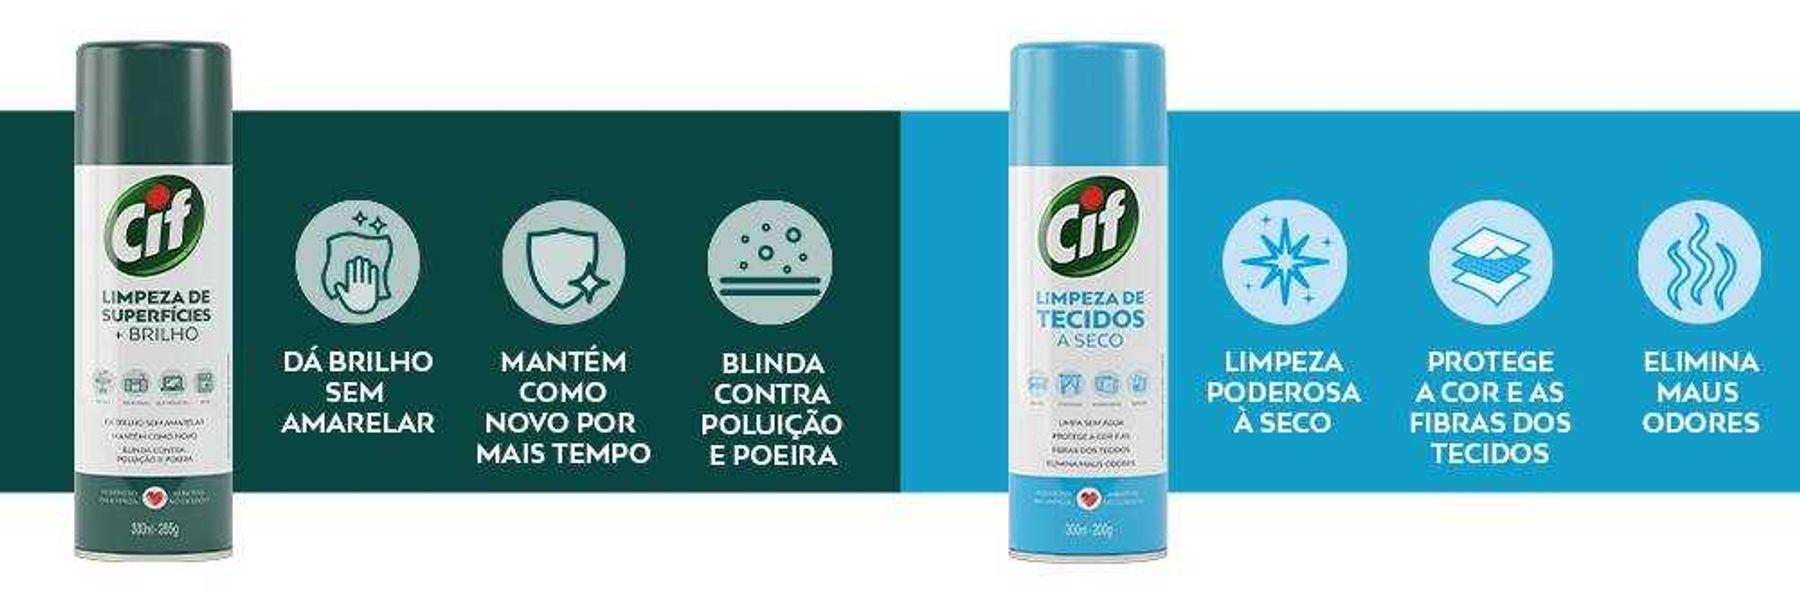 cif-multiuso-sprays